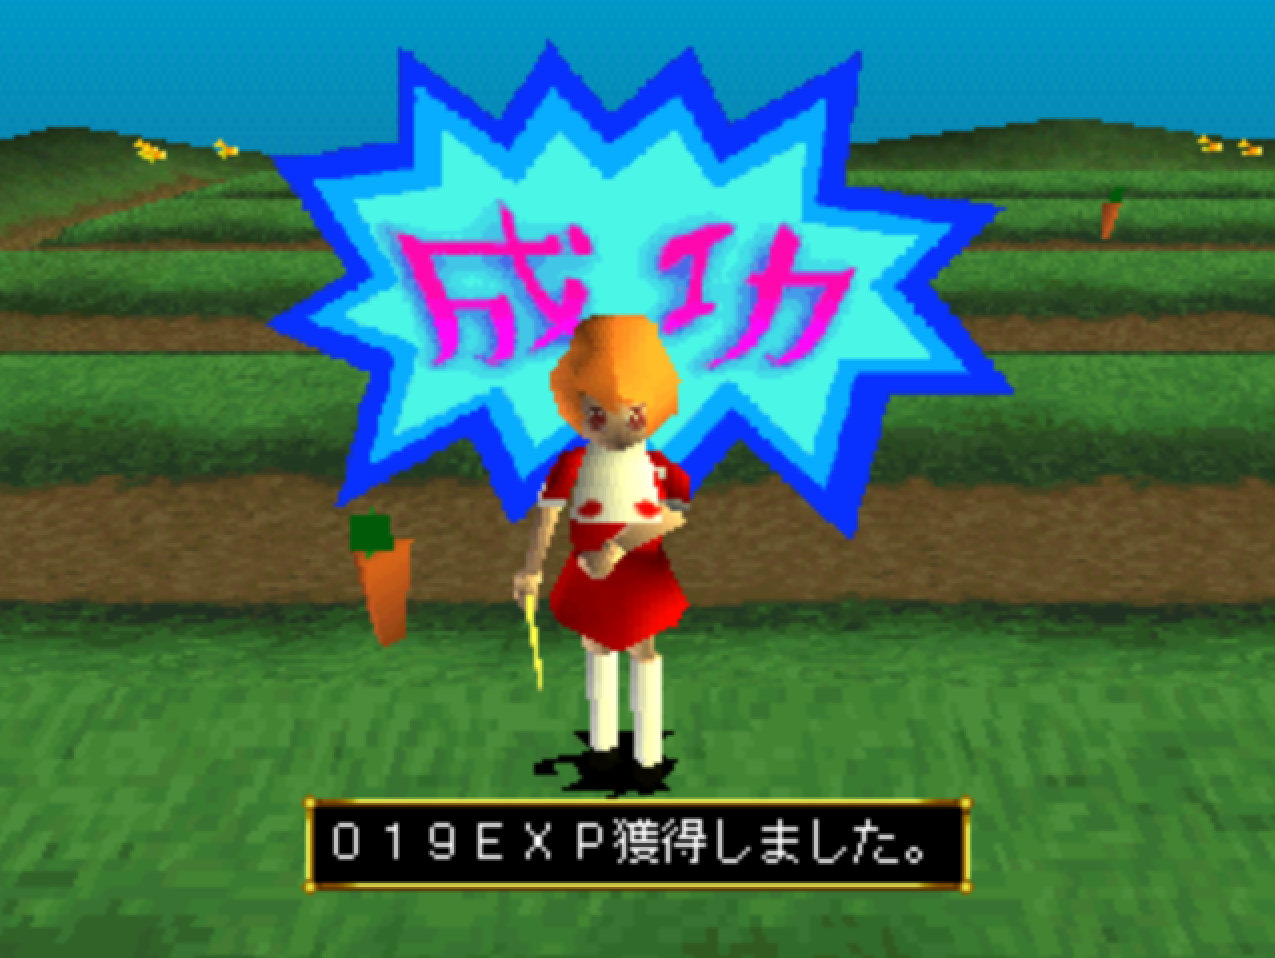 Majokko Daisakusen Little Witching Mischiefs